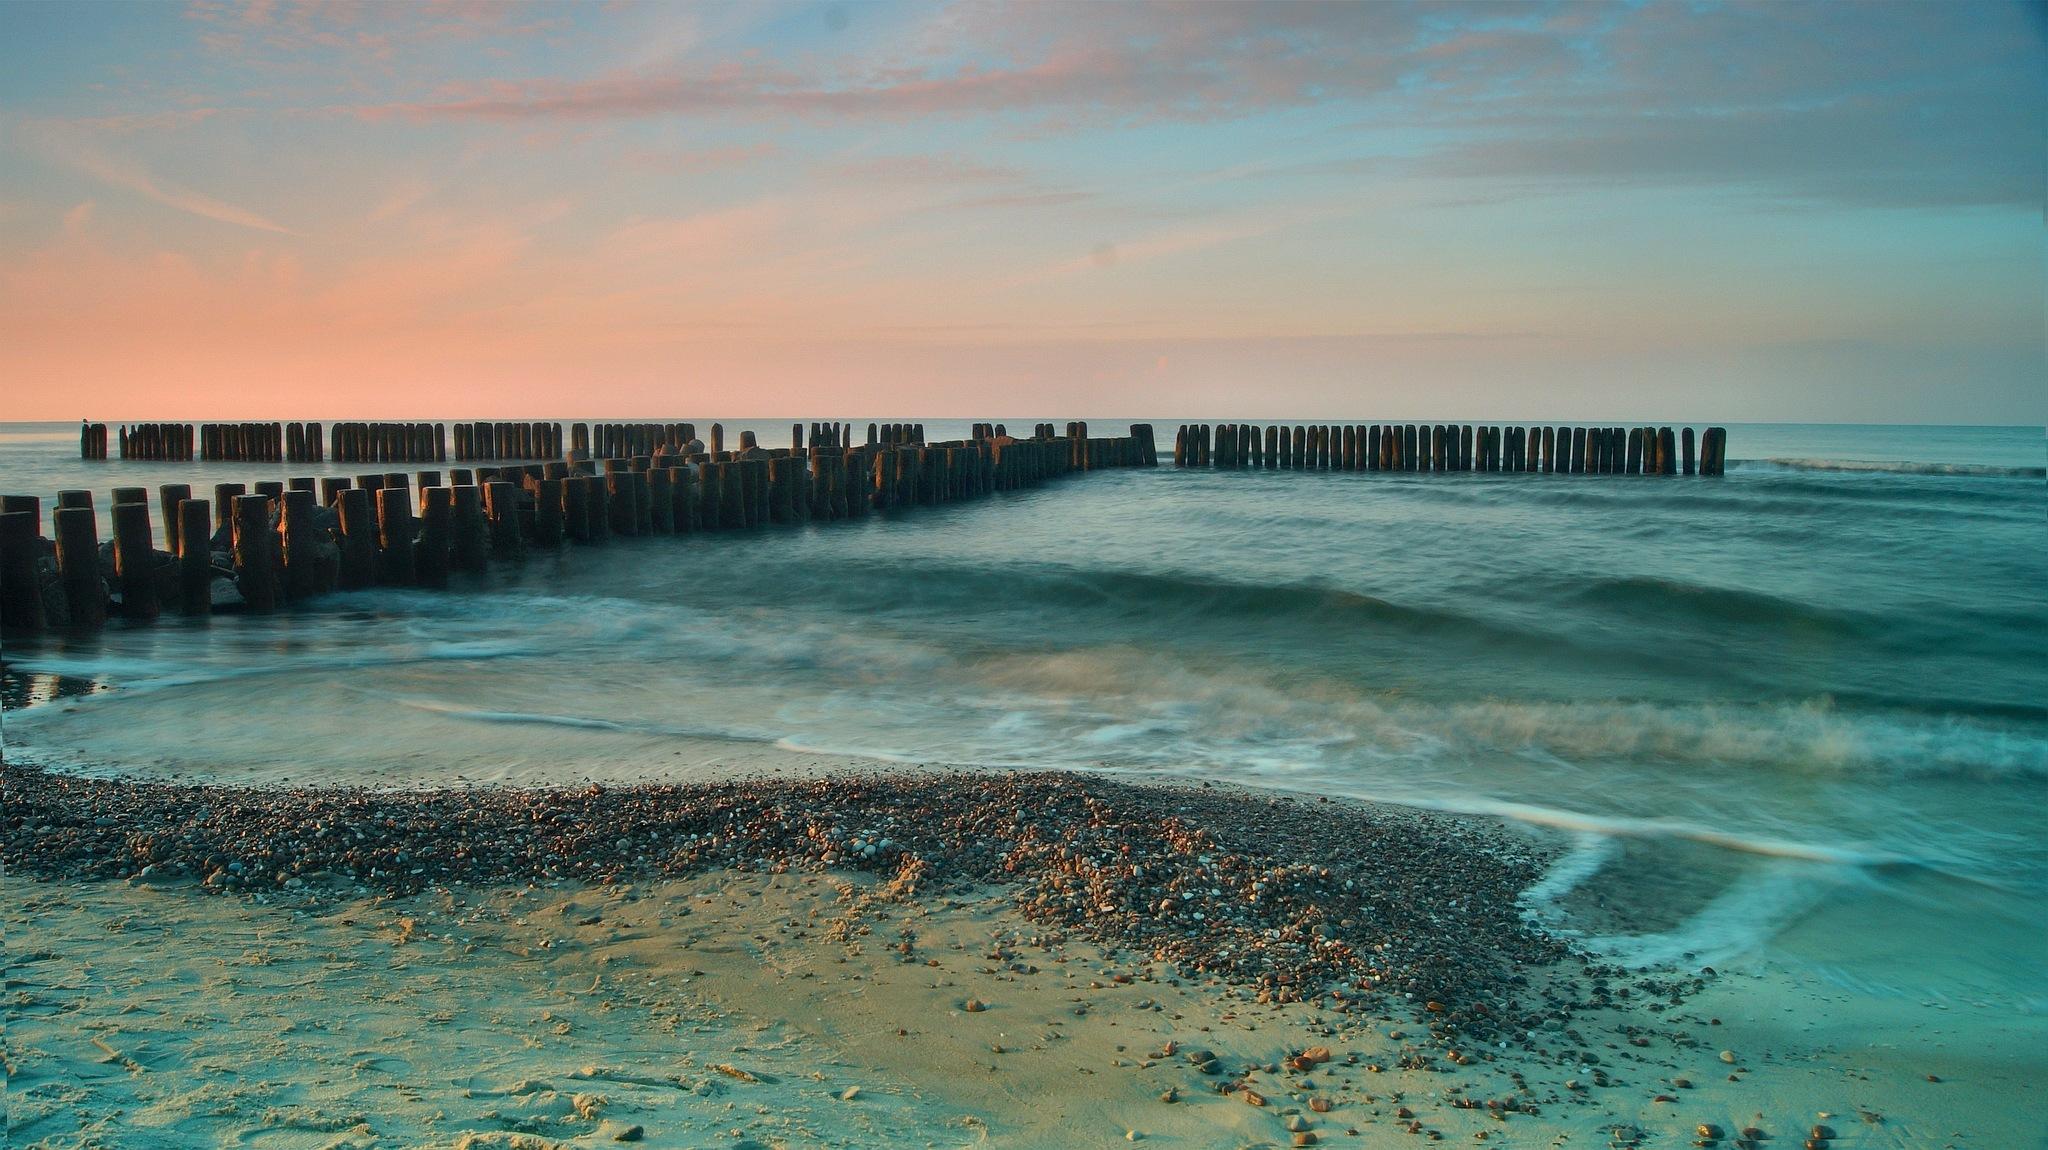 baltic sea by janeczek